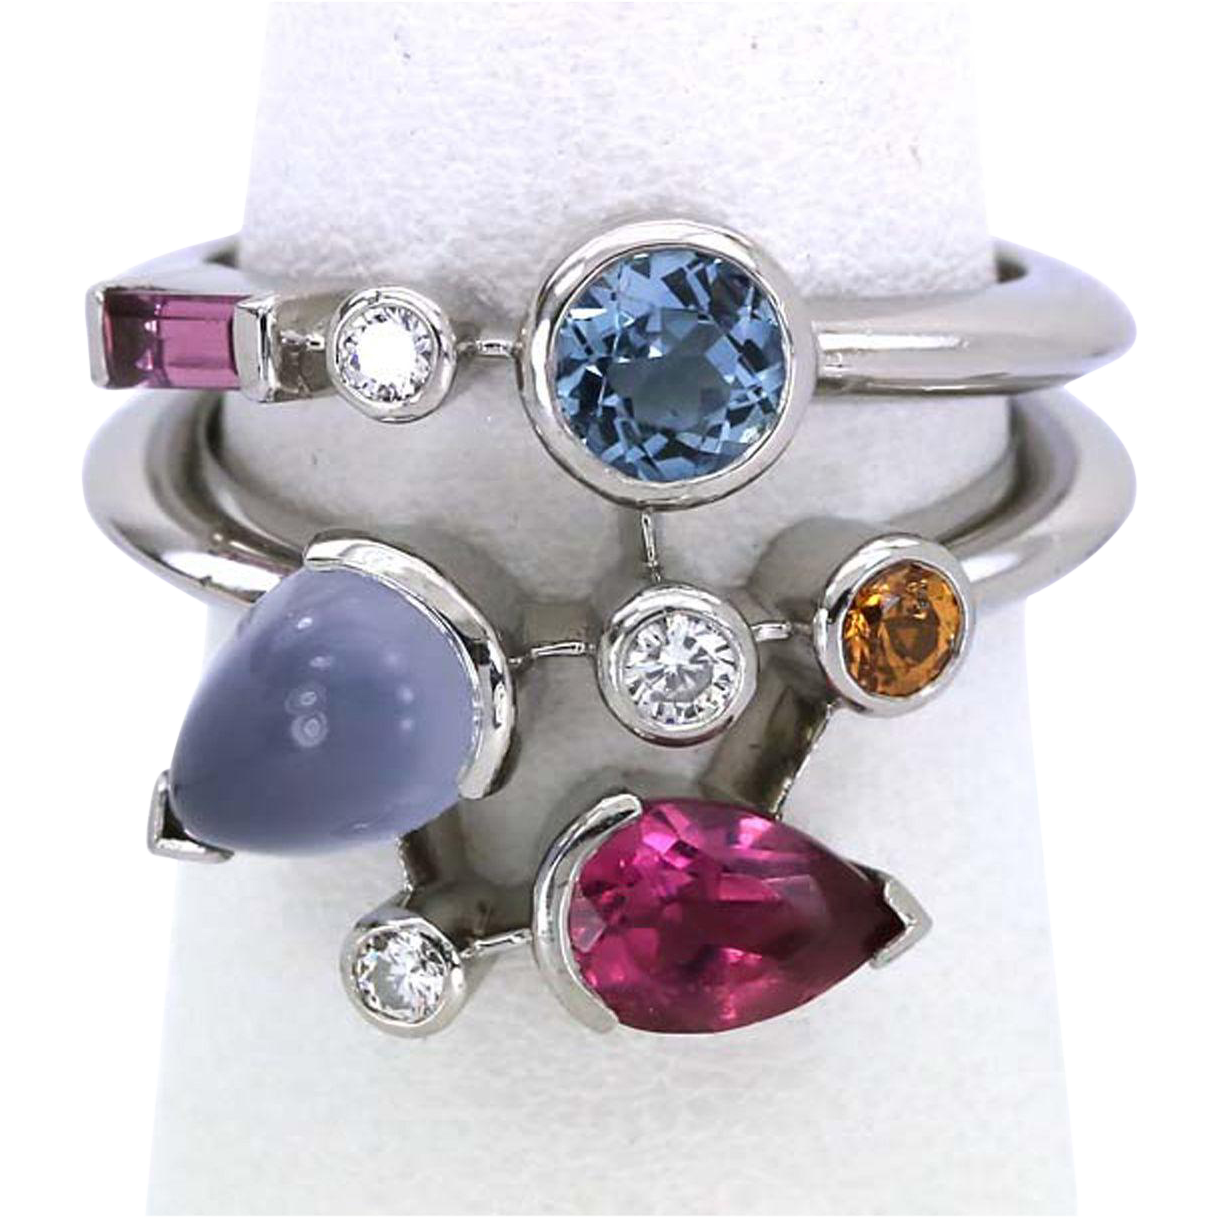 Cartier Meli Melo Ring Platinum Diamond Gemstone